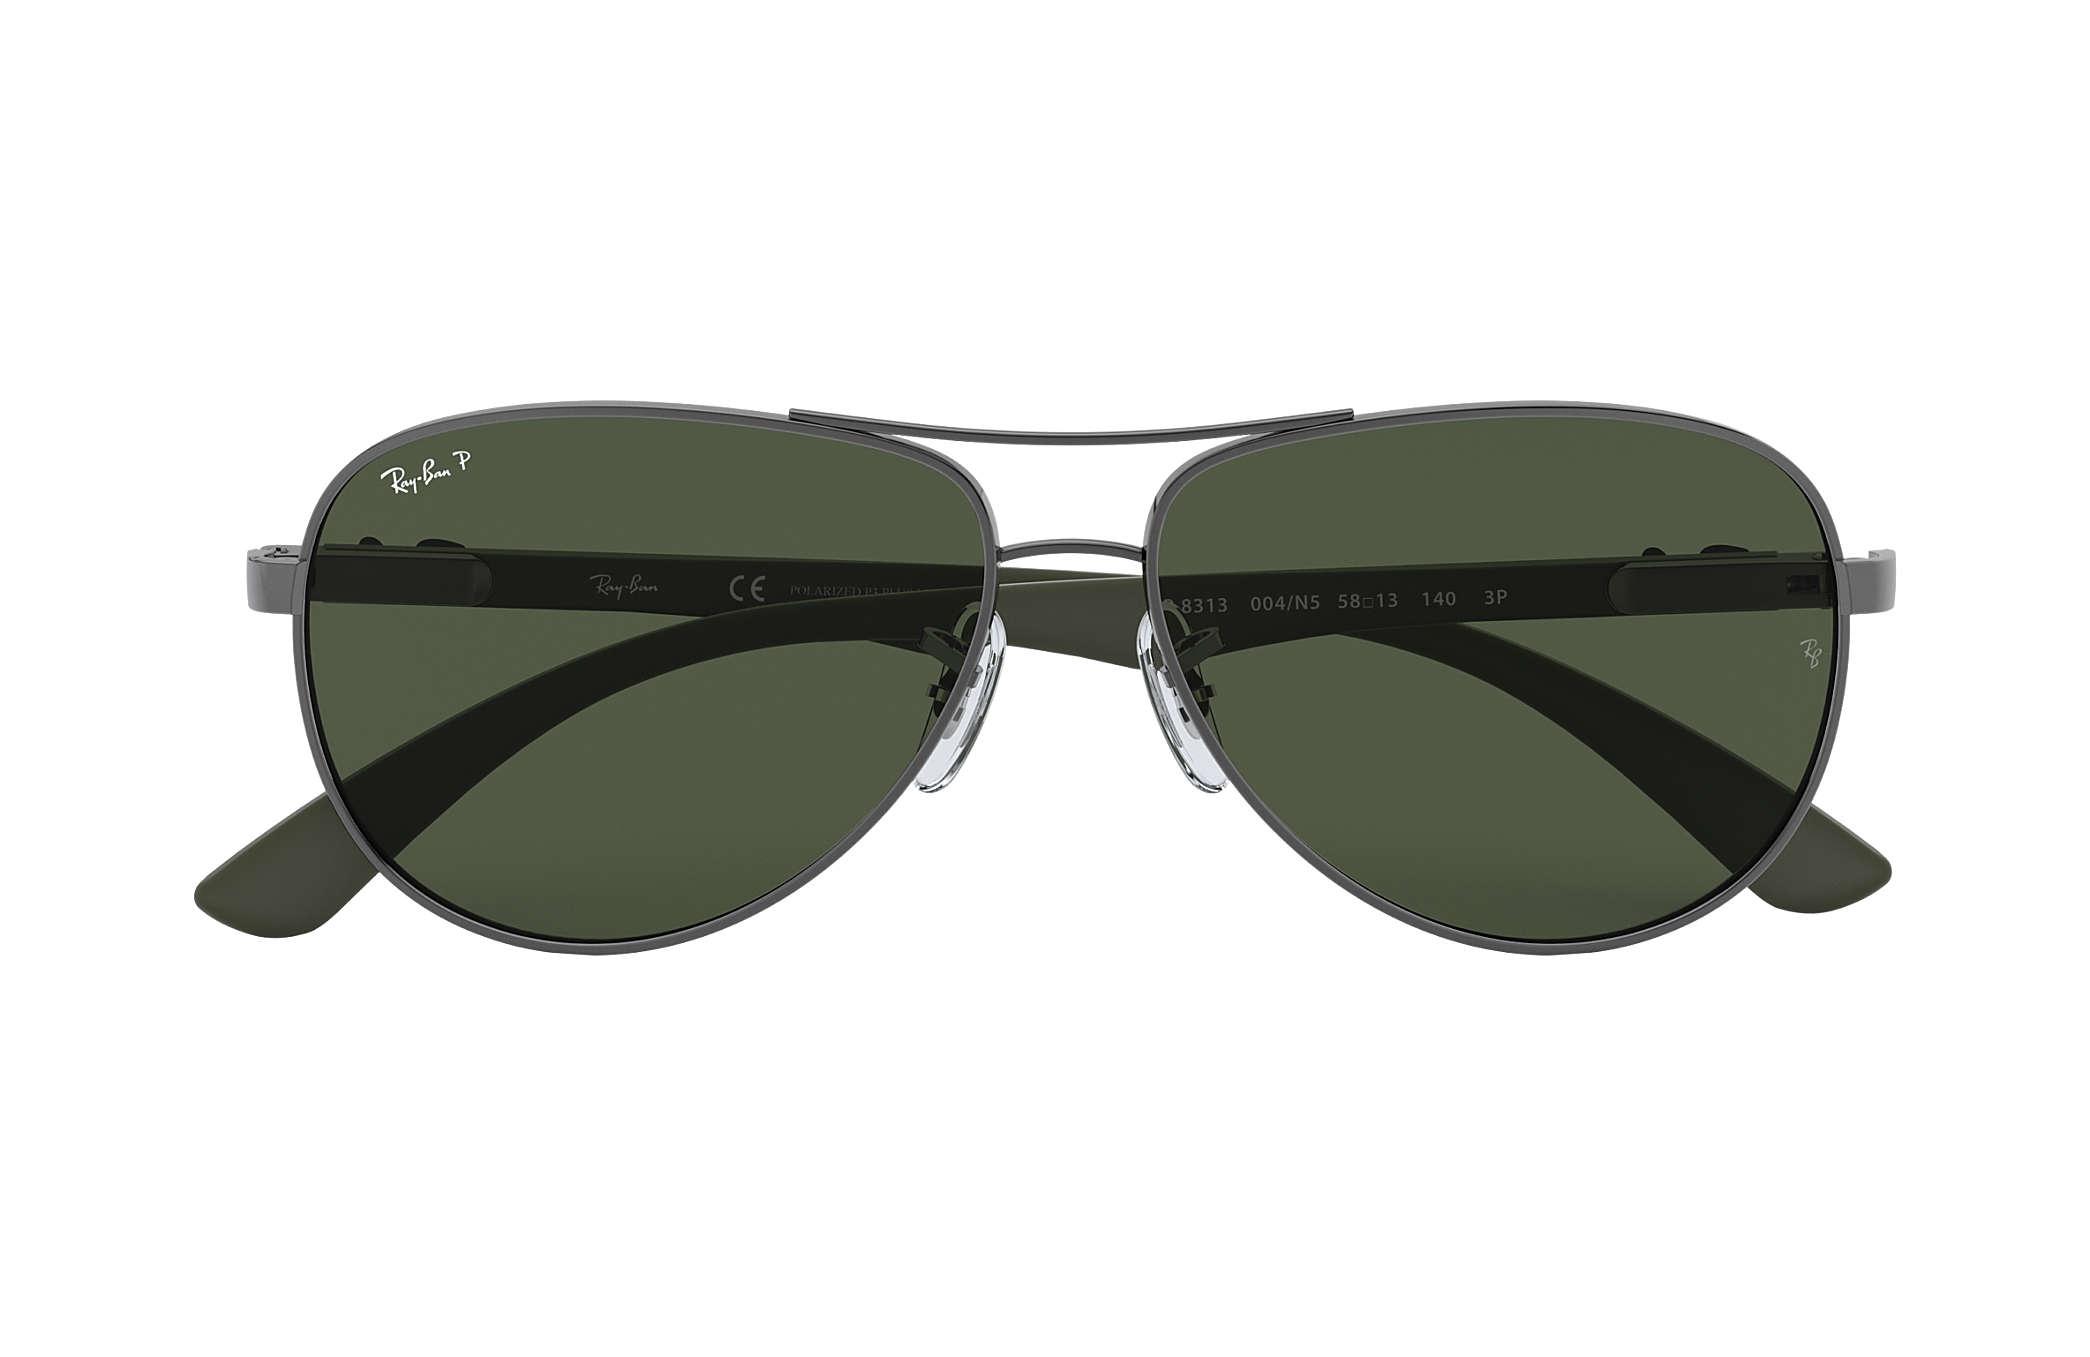 0d937ec34e42c Ray-Ban RB8313 Gunmetal - Carbon Fibre - Green Polarized Lenses ...